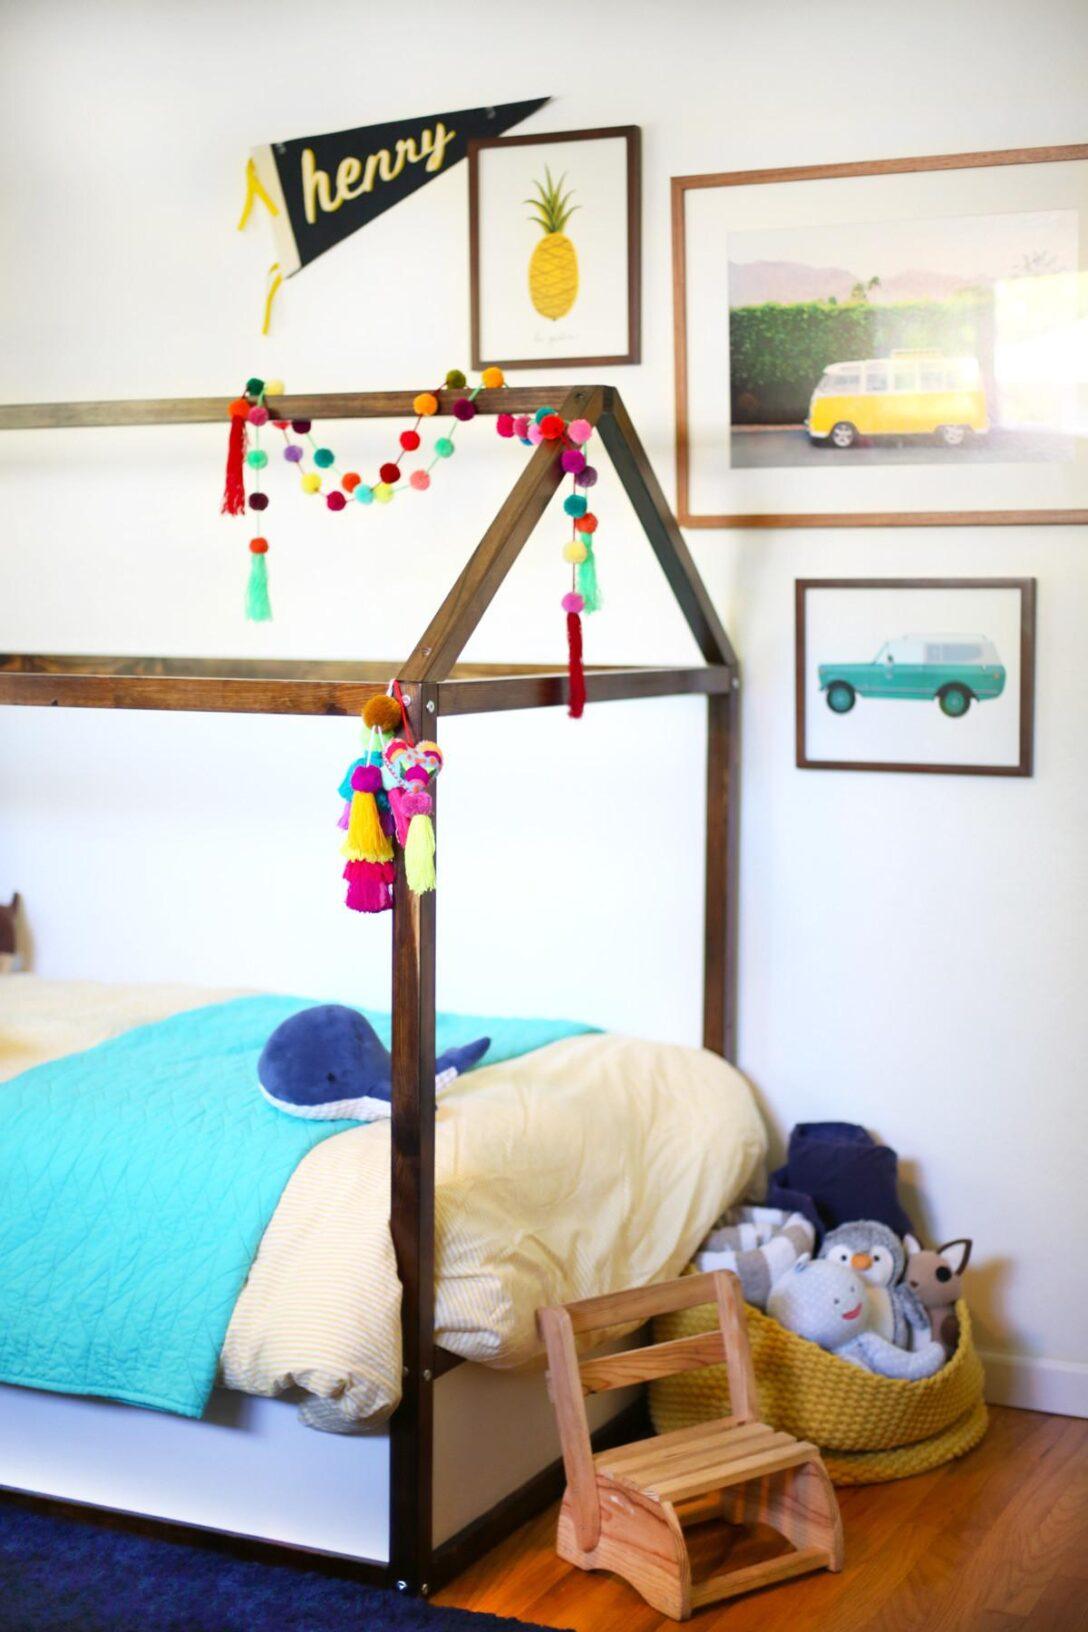 Large Size of Ikea Kura Hack Storage House Bed Montessori Hacks Pinterest Bunk Instructions Stairs Ideas Double Mesmerizing Diy Kids Room That Make Cute Minimalist Wohnzimmer Kura Hack